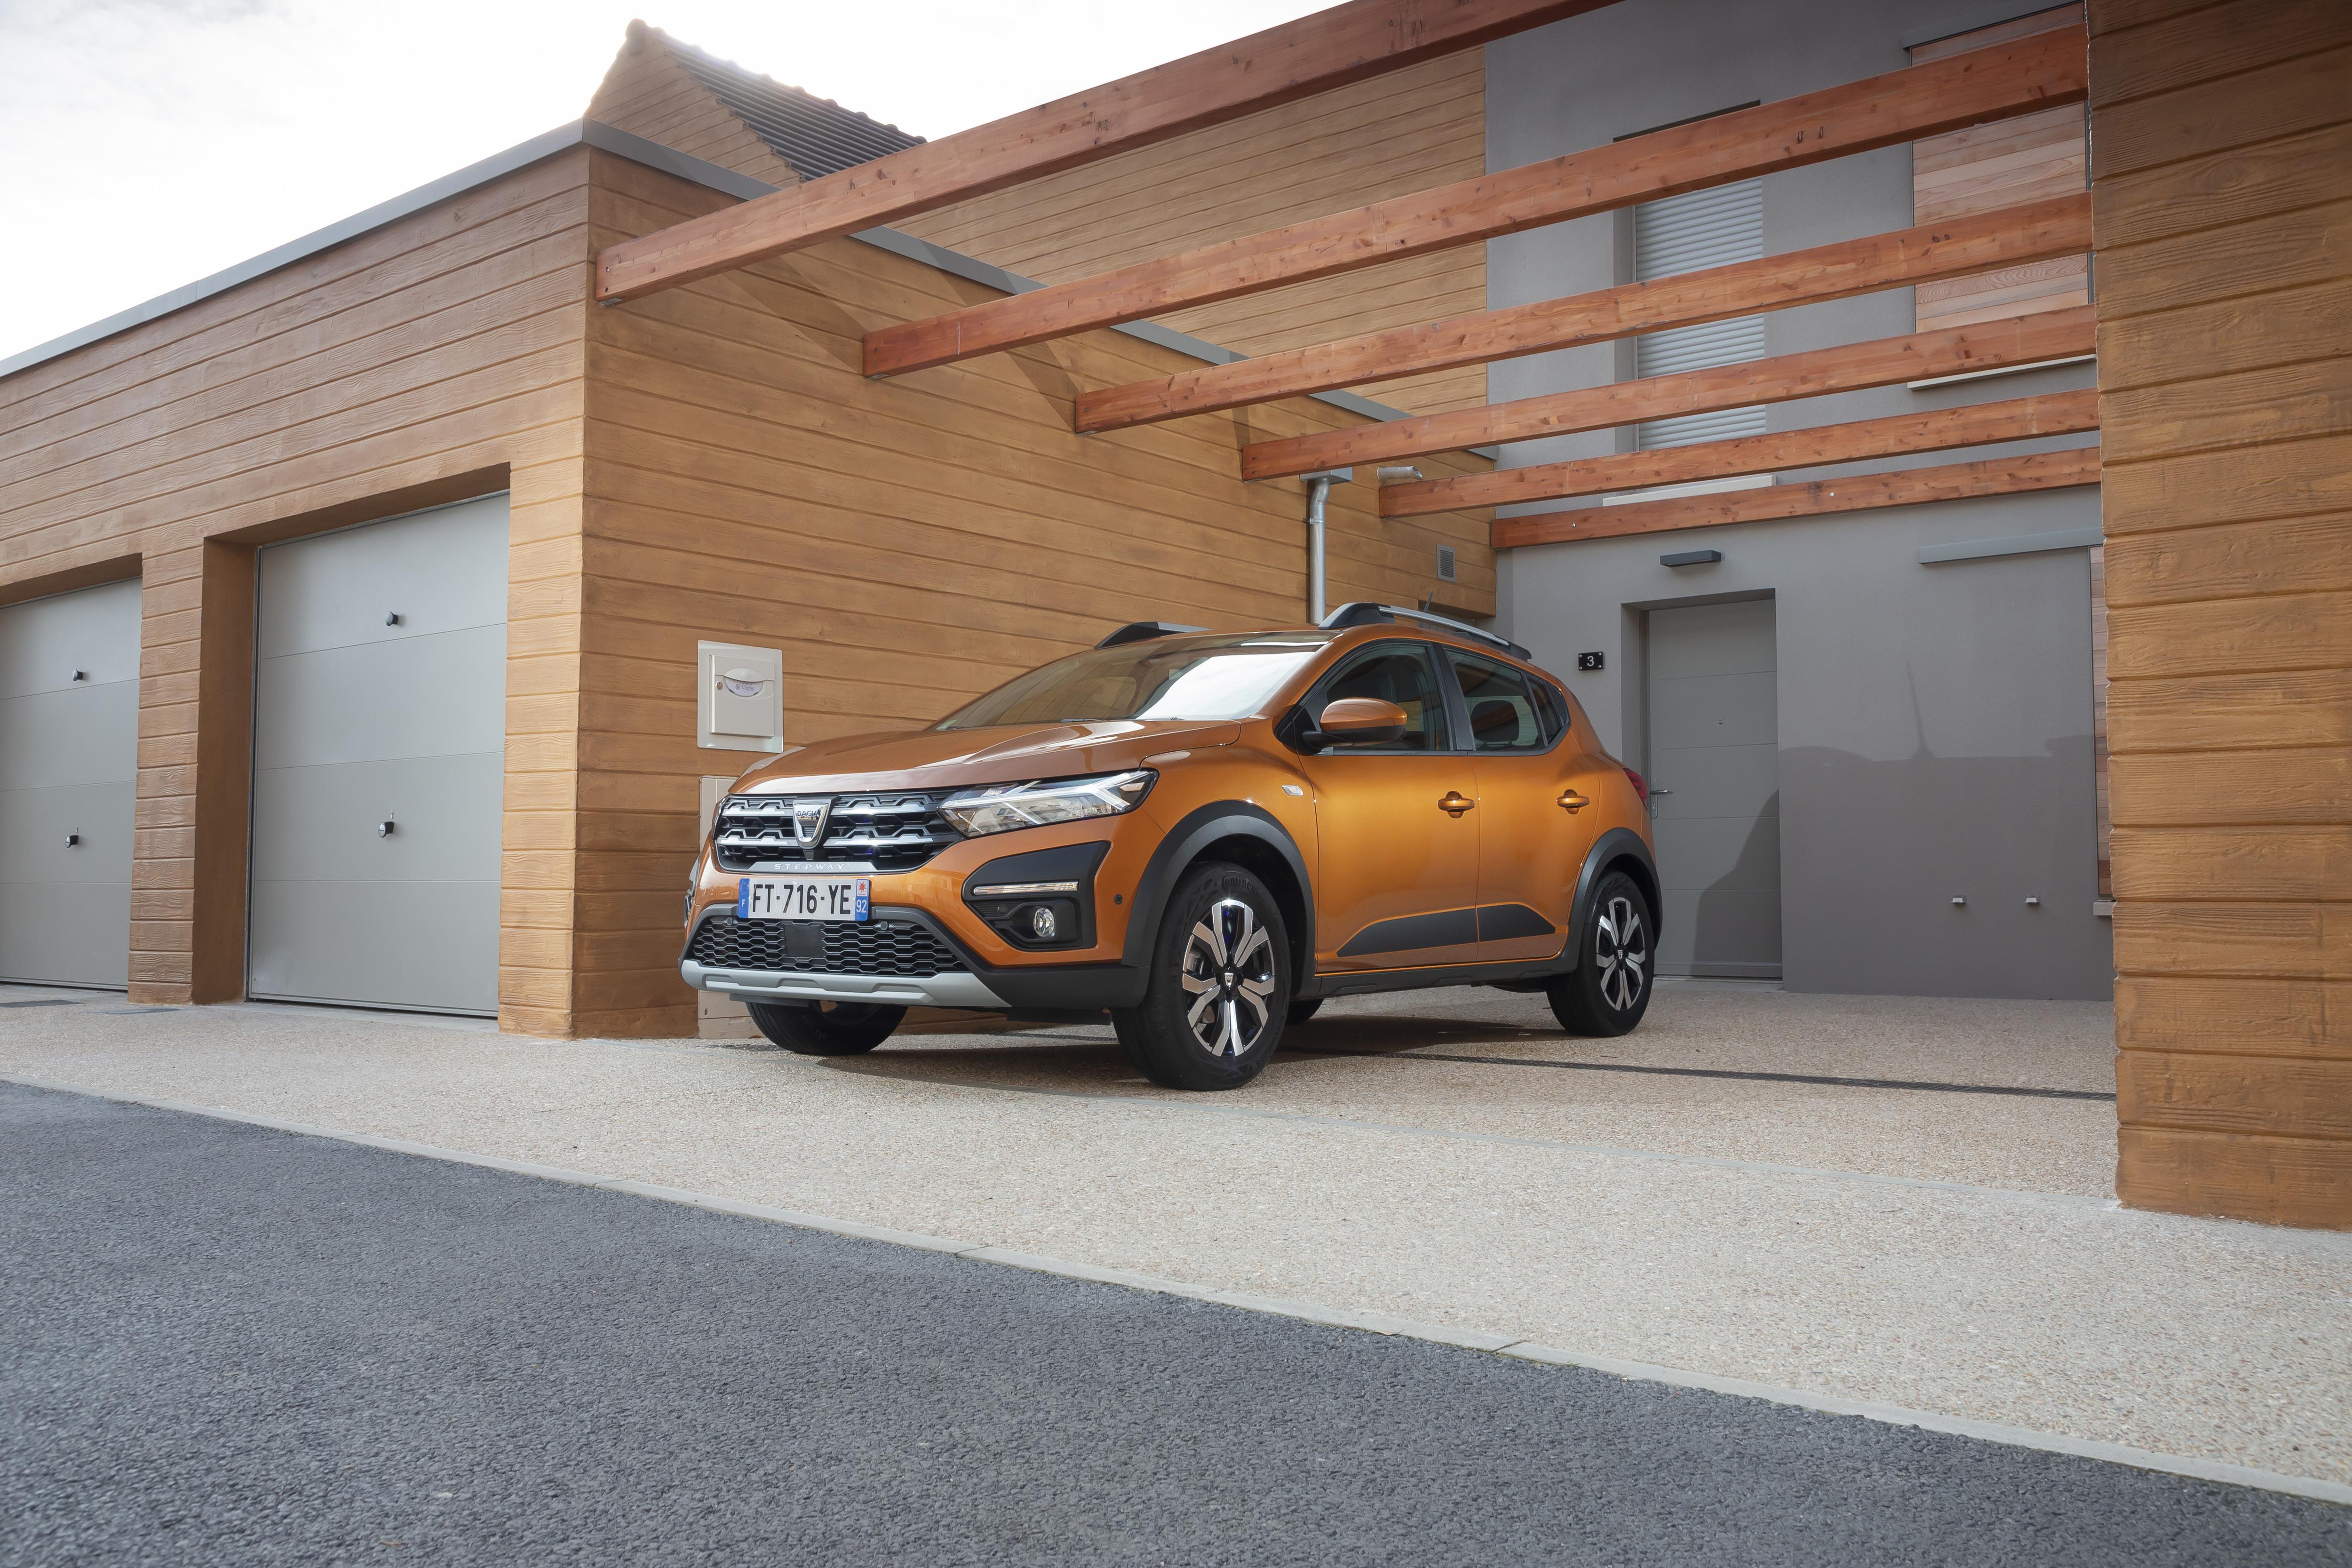 2020 - Essais presse Nouvelle Dacia SANDERO STEPWAY (4)